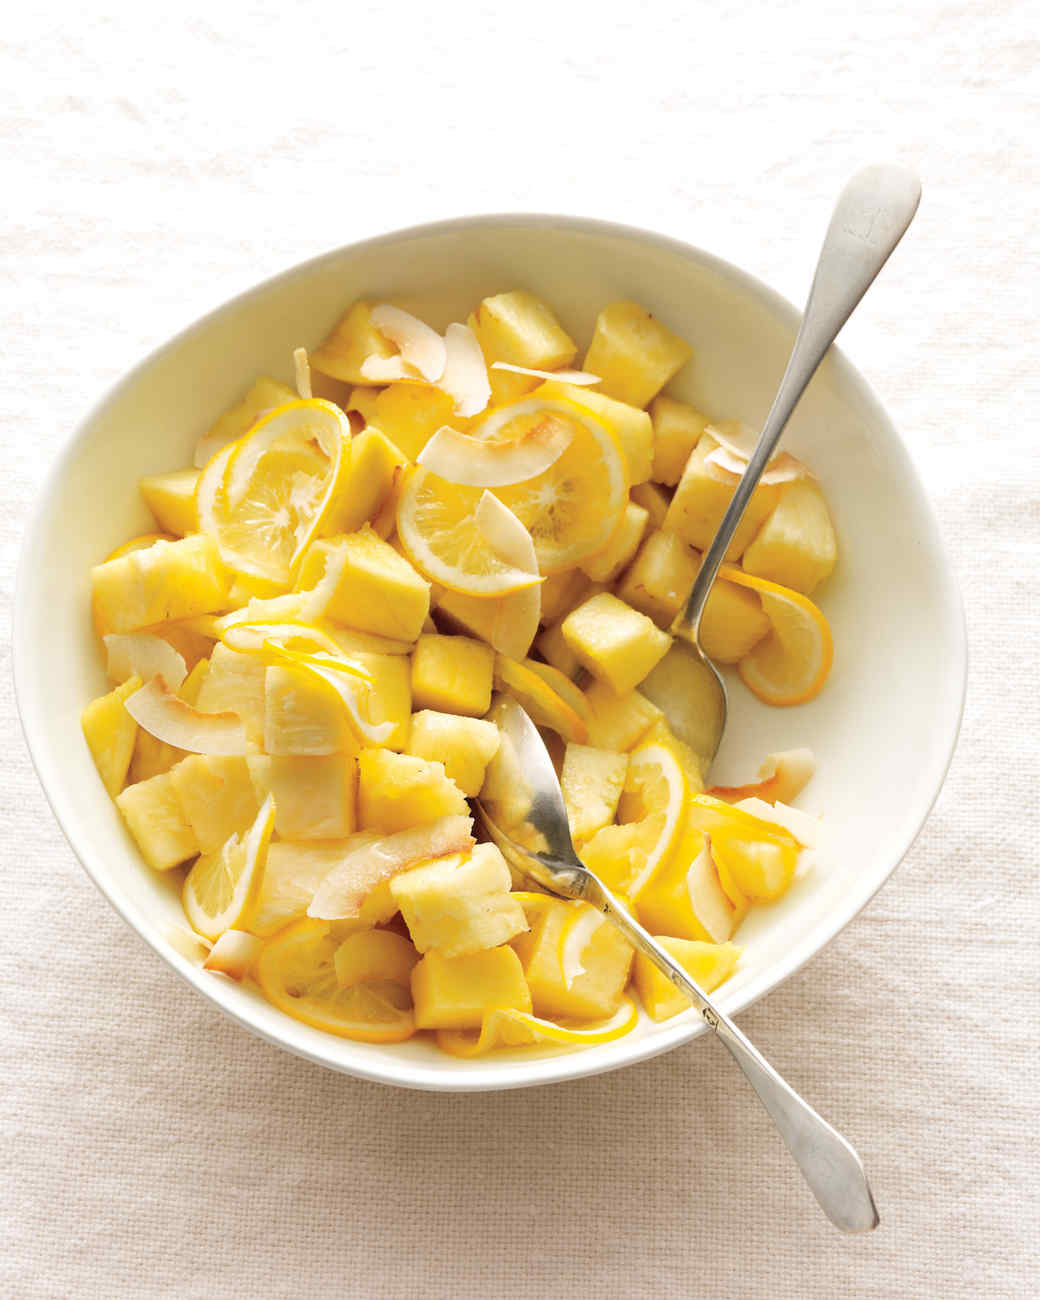 Pineapple, Mango, and Meyer Lemon Salad